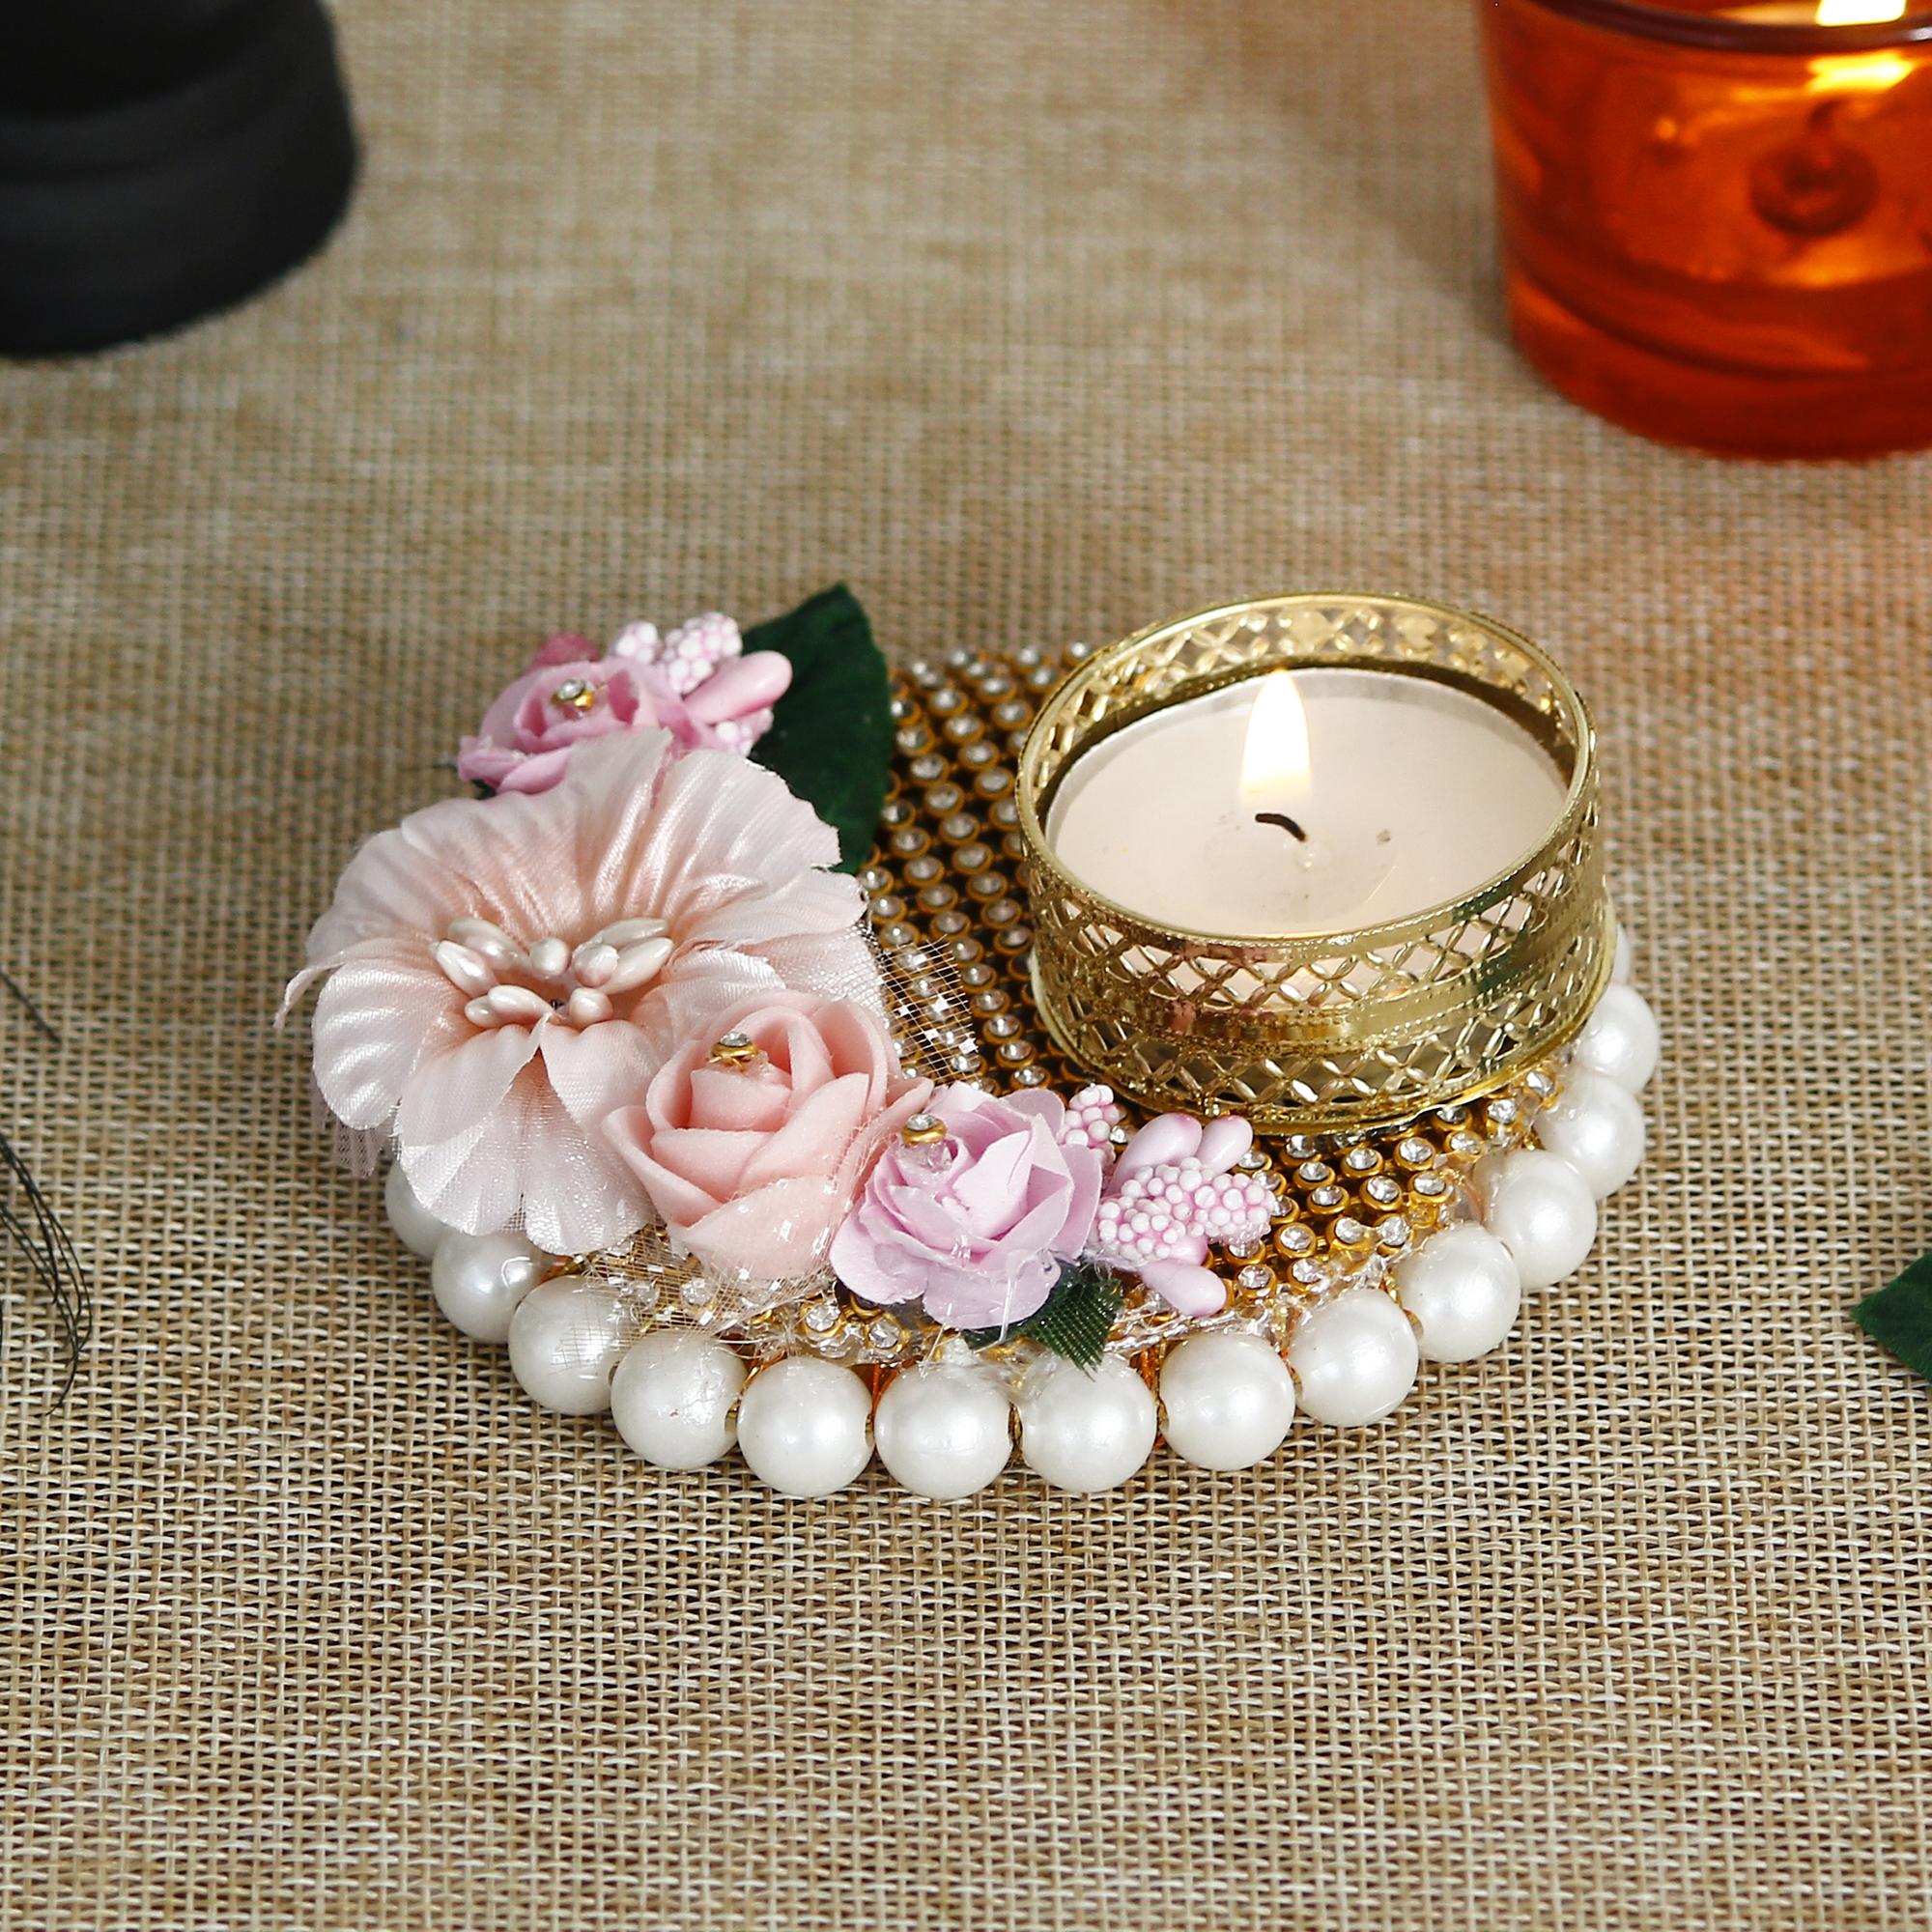 Decorative Handcrafted Pink Floral Tea Light Holder Indian Home Decor